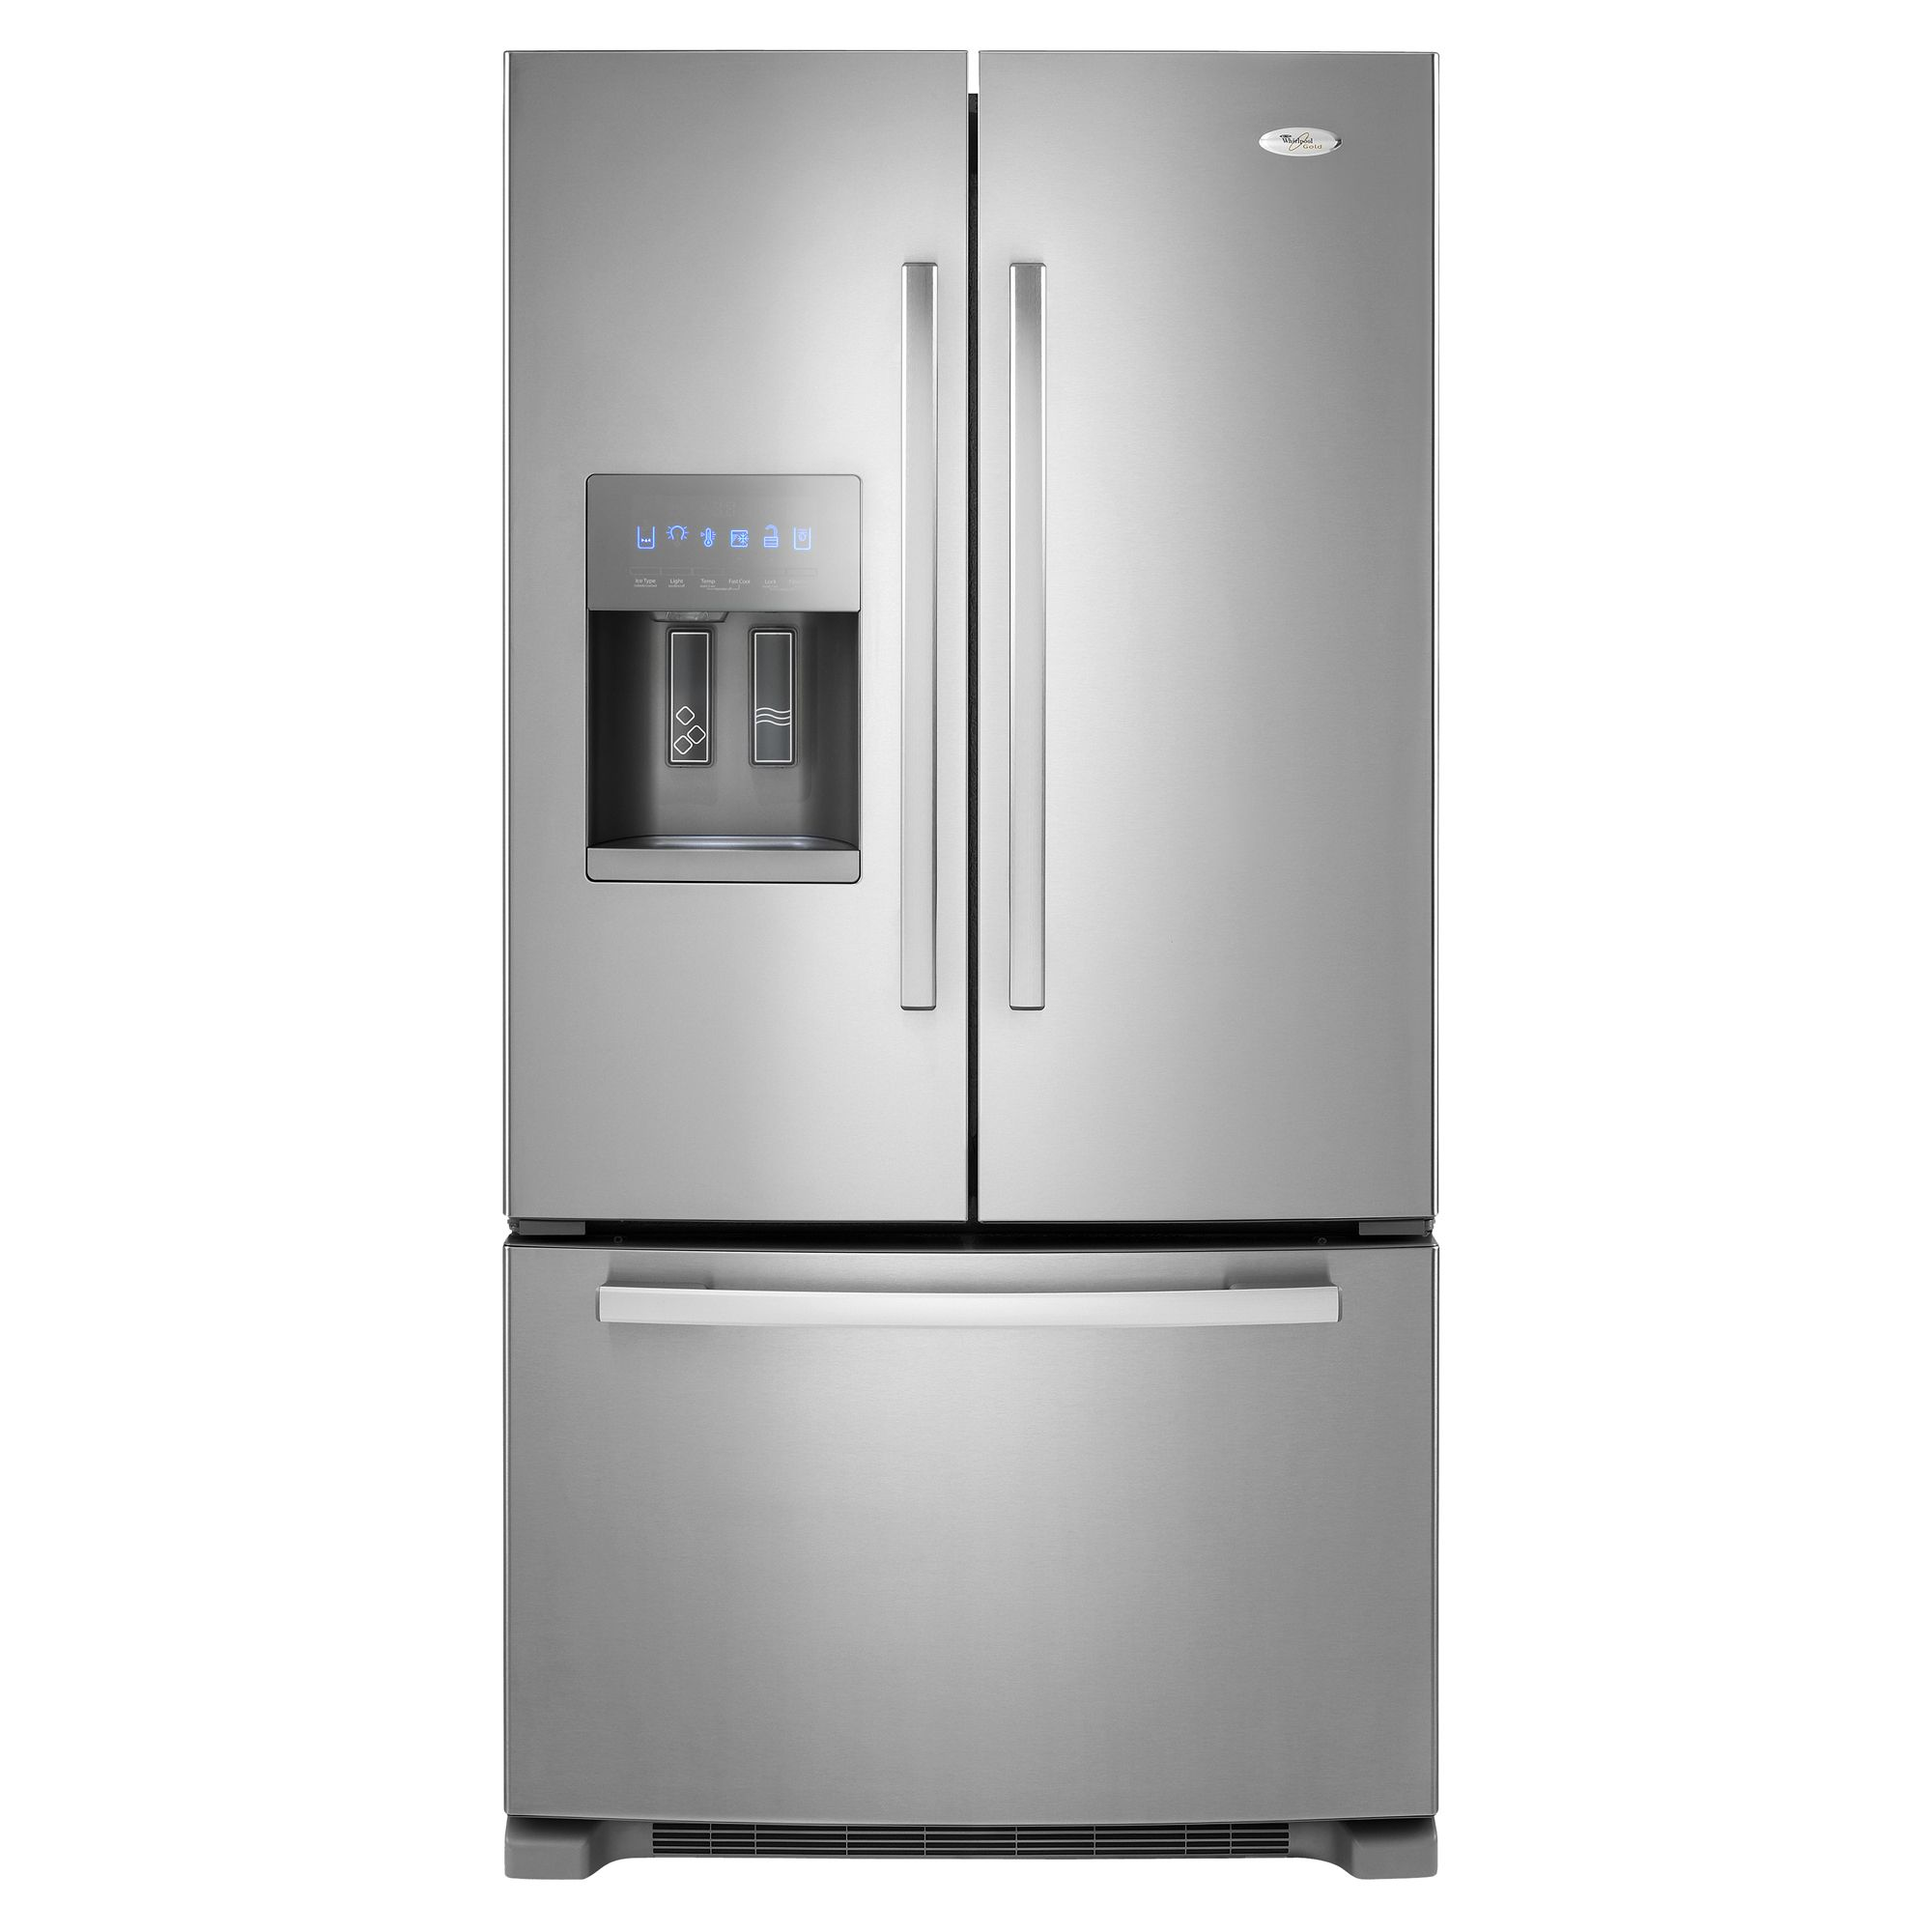 Superbe Whirlpool Gold French Door Refrigerator 25.5 Cu. Ft. GI6FARXXY   Sears